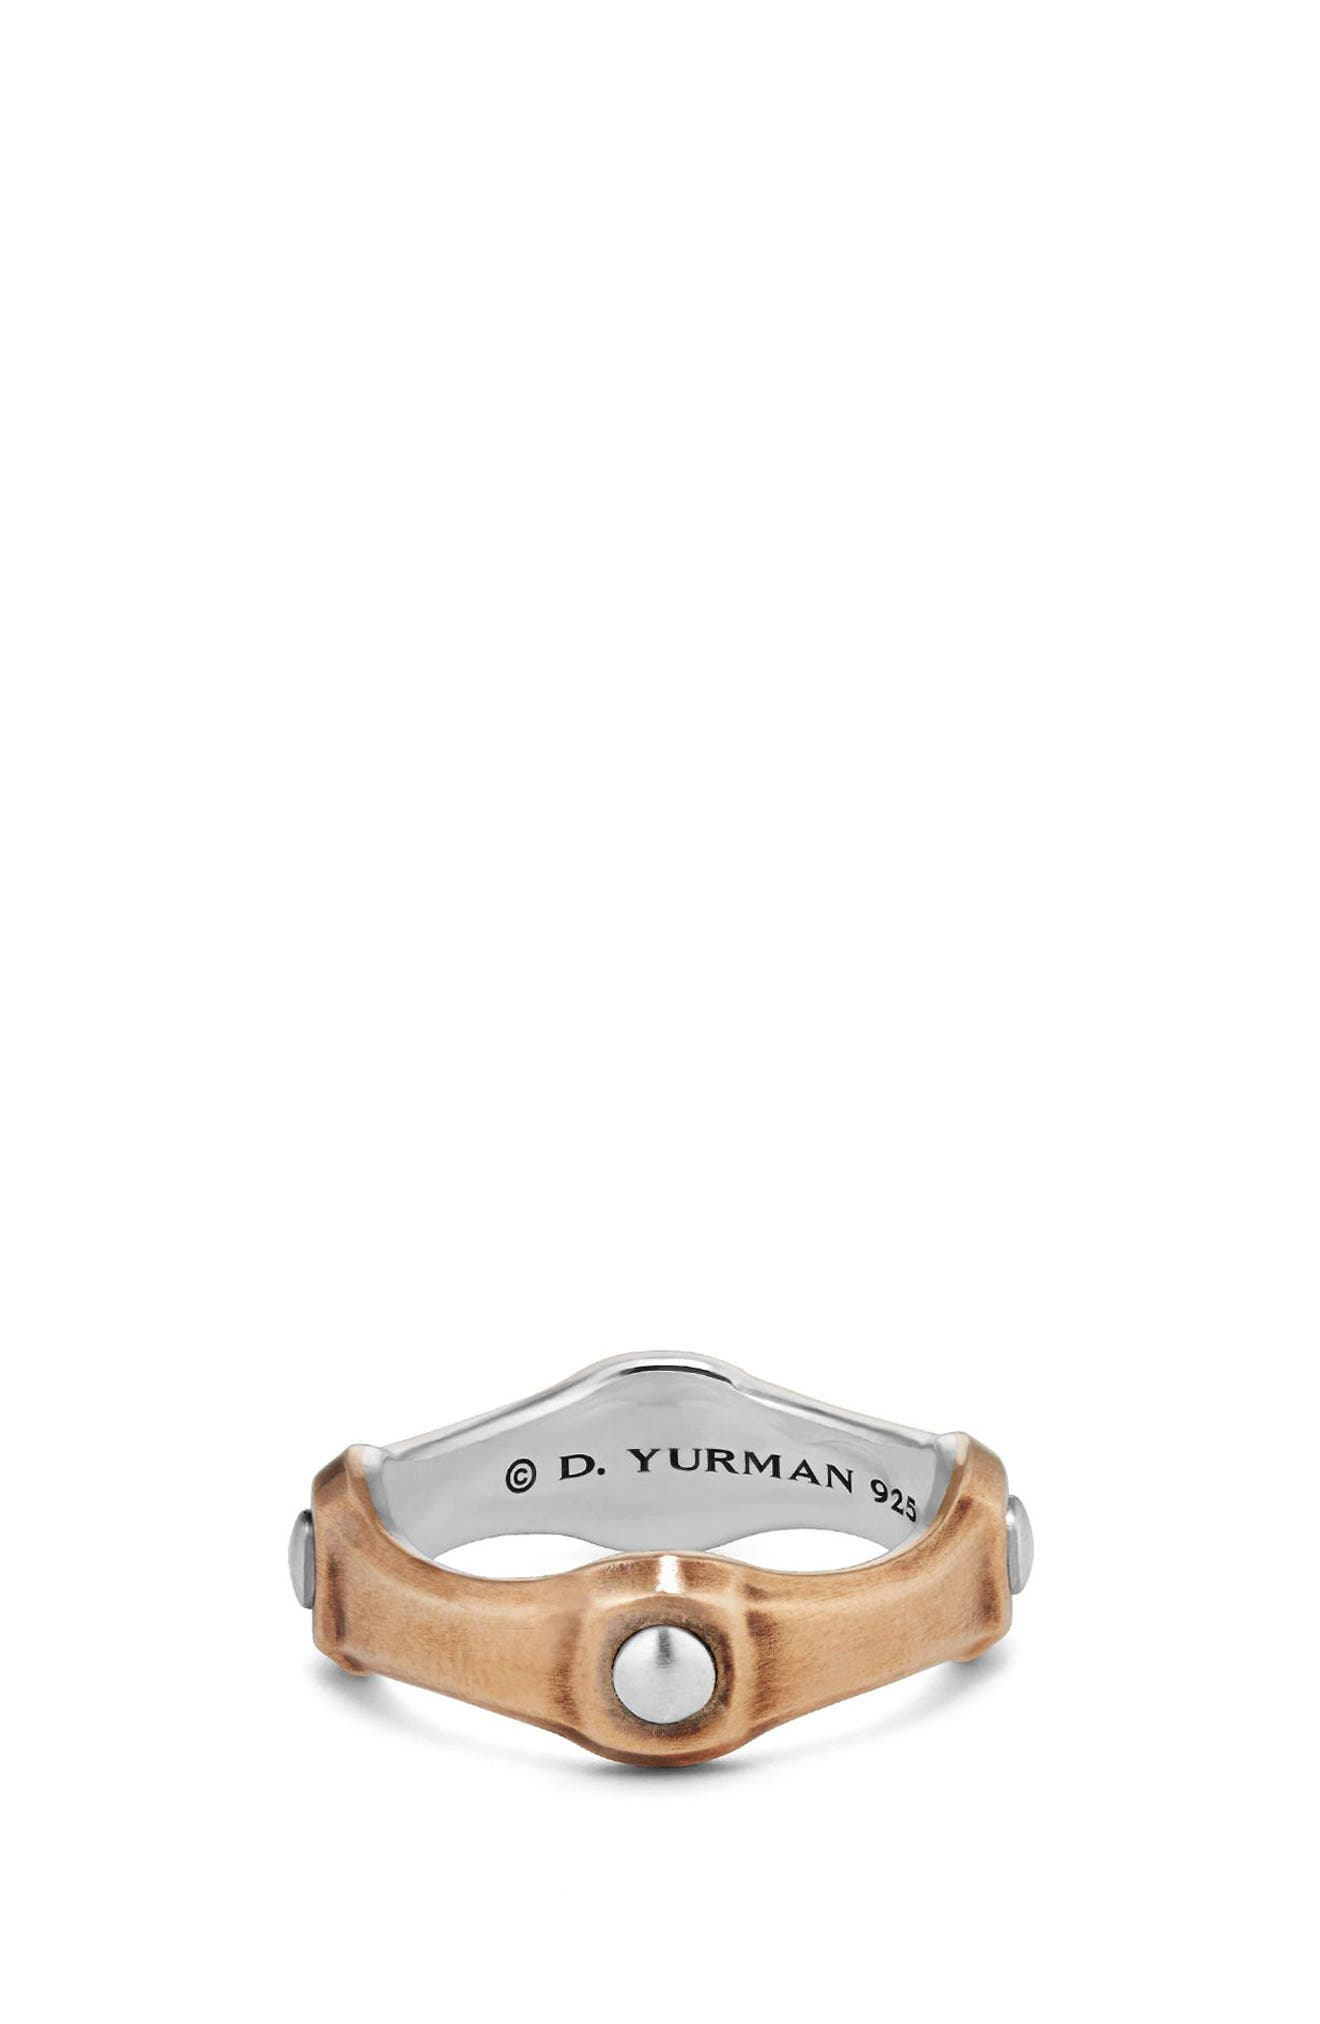 David Yurman Anvil Band Ring with Bronze, 8mm